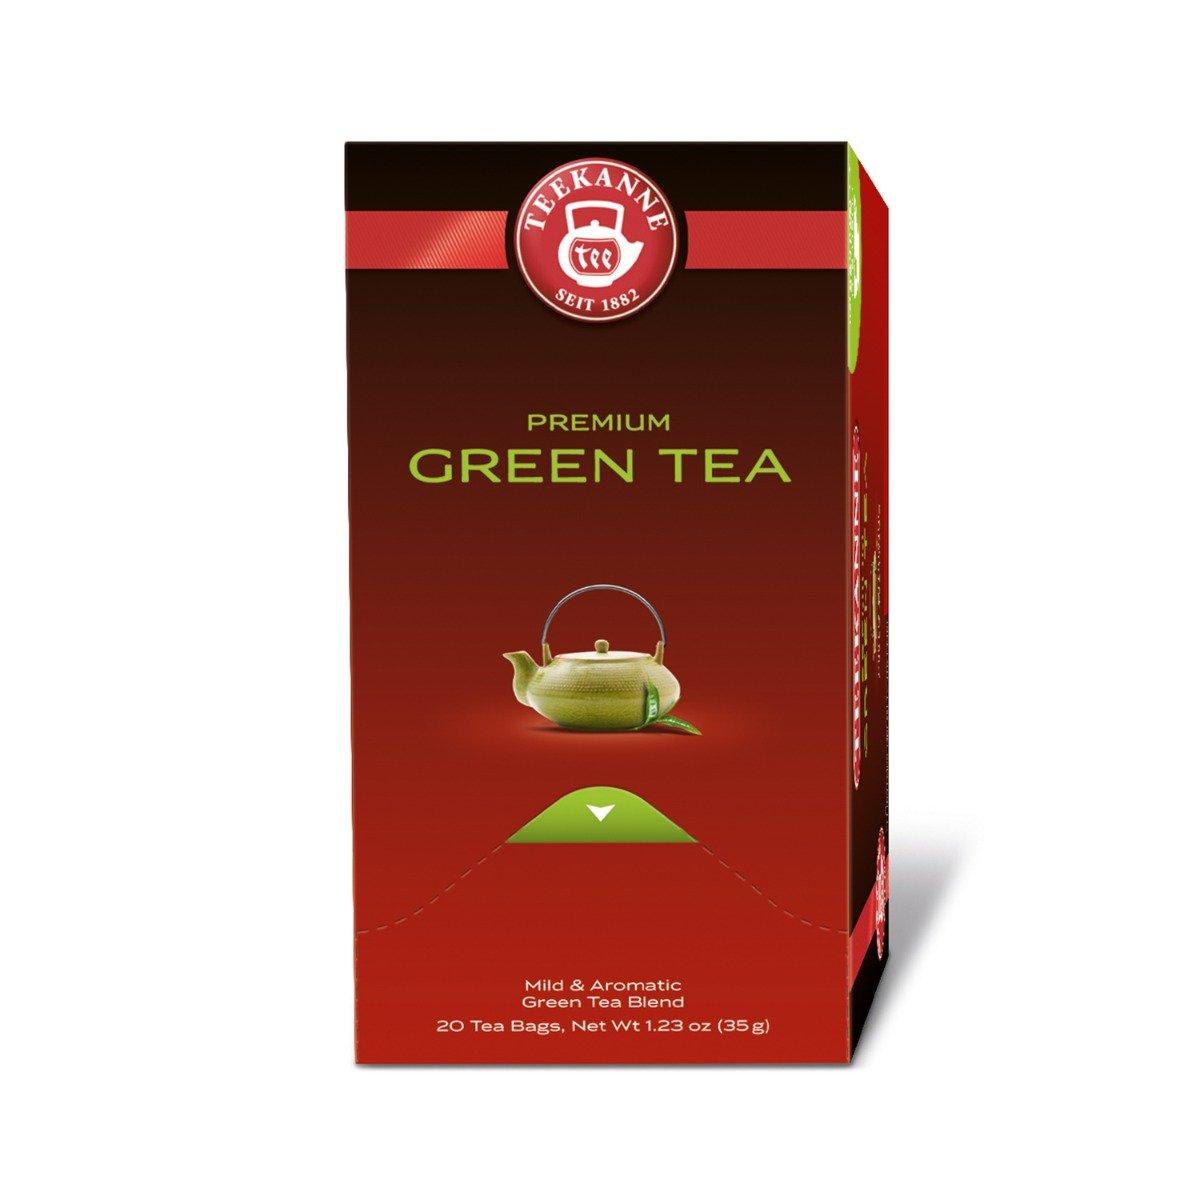 Cutie Ceai Green Tea Premium Teekanne, 1.75g x 20 pliculete imagine